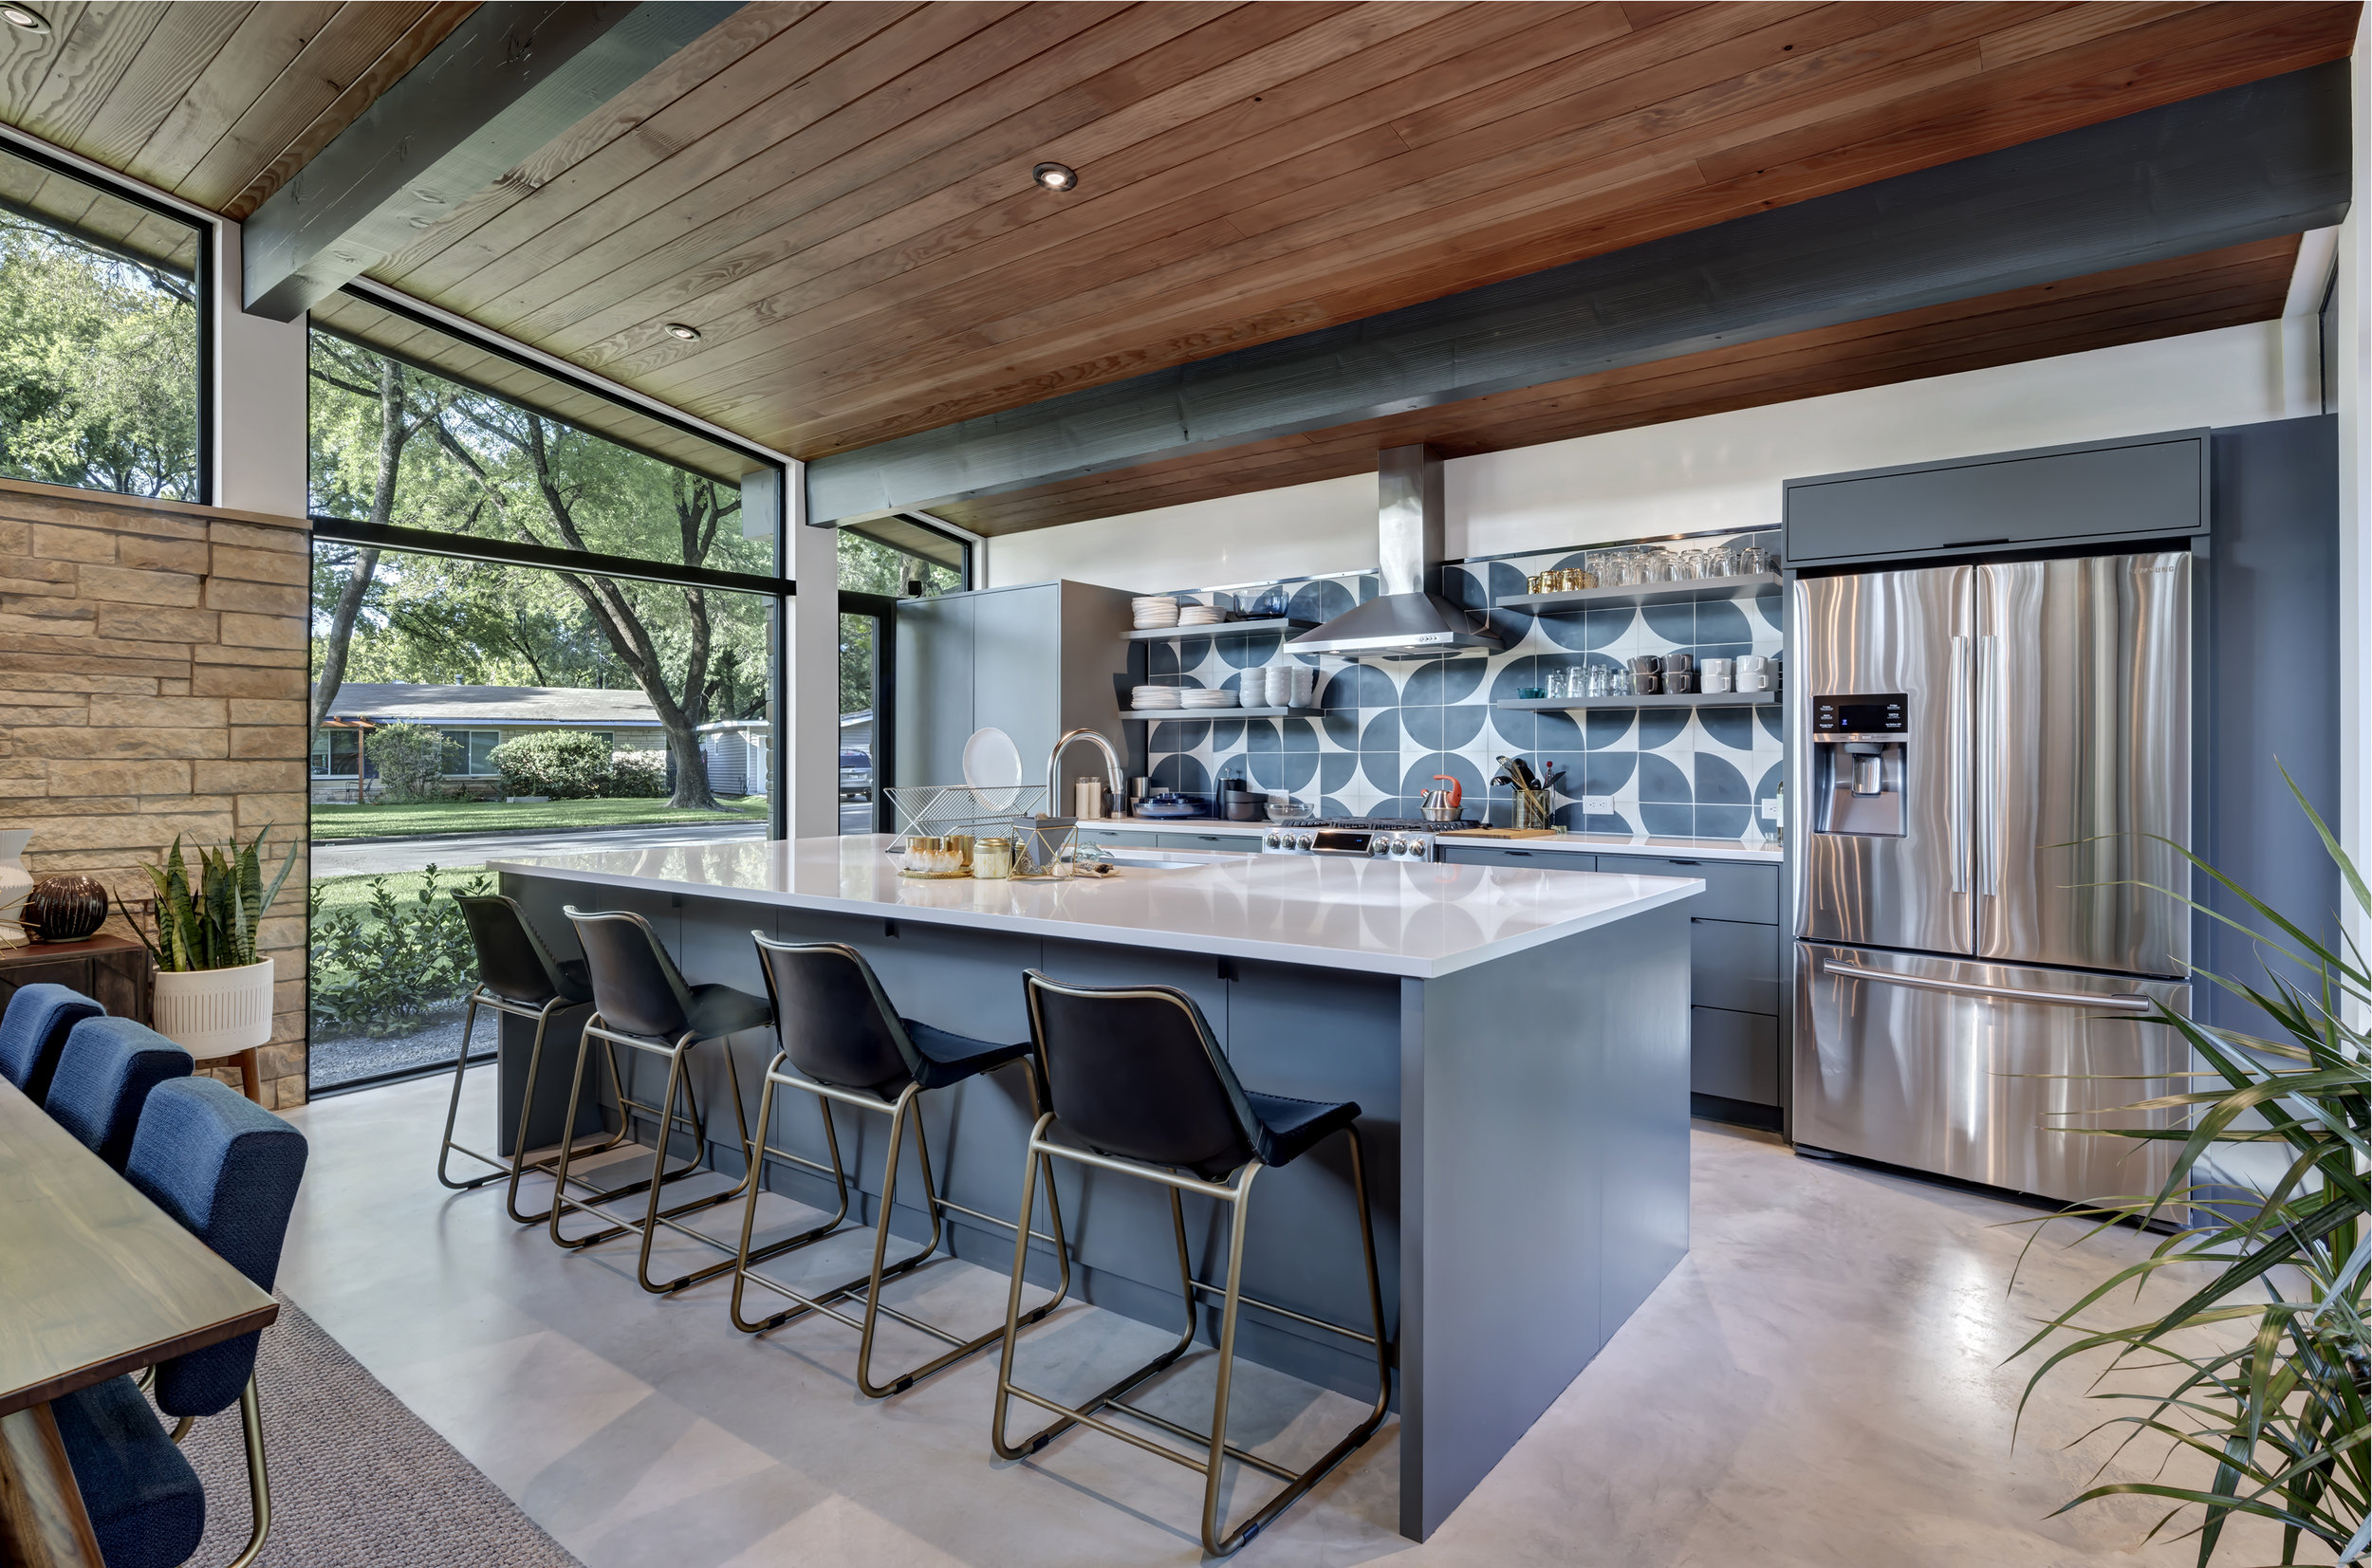 06 Re-Open House by Matt Fajkus Architecture - Photo by Charles Davis Smith.jpg